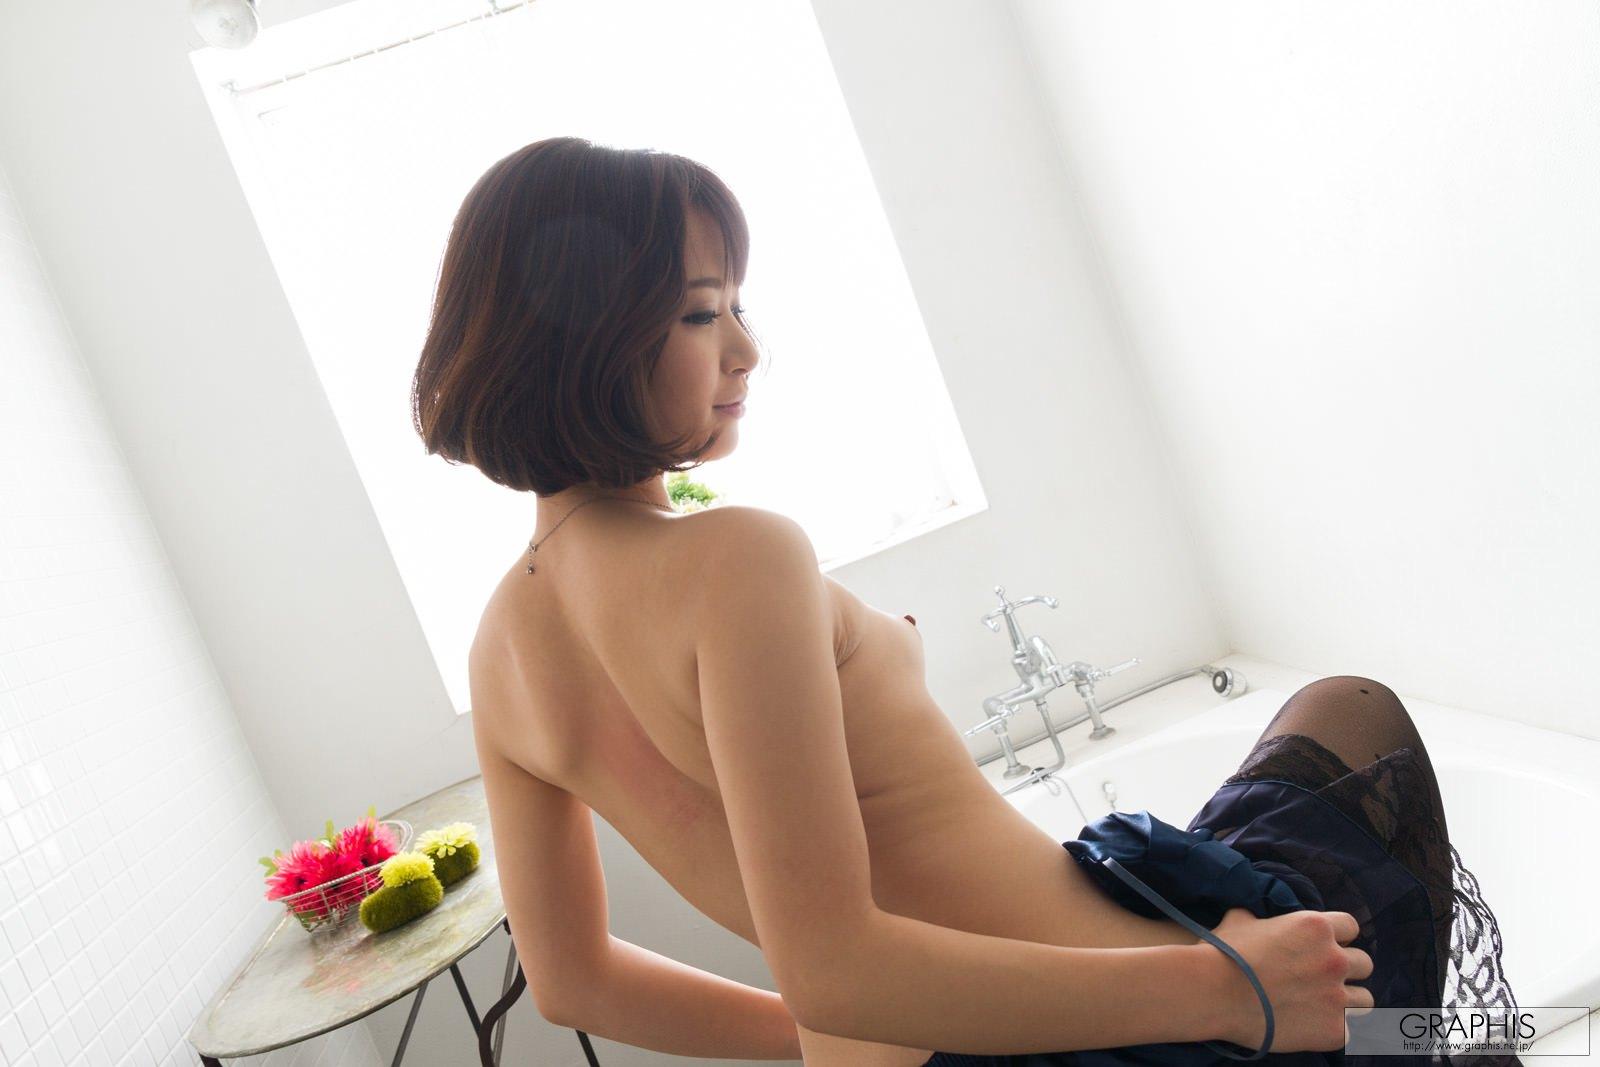 mayu-kamiya-bathroom-black-stockings-asian-naked-graphis-12